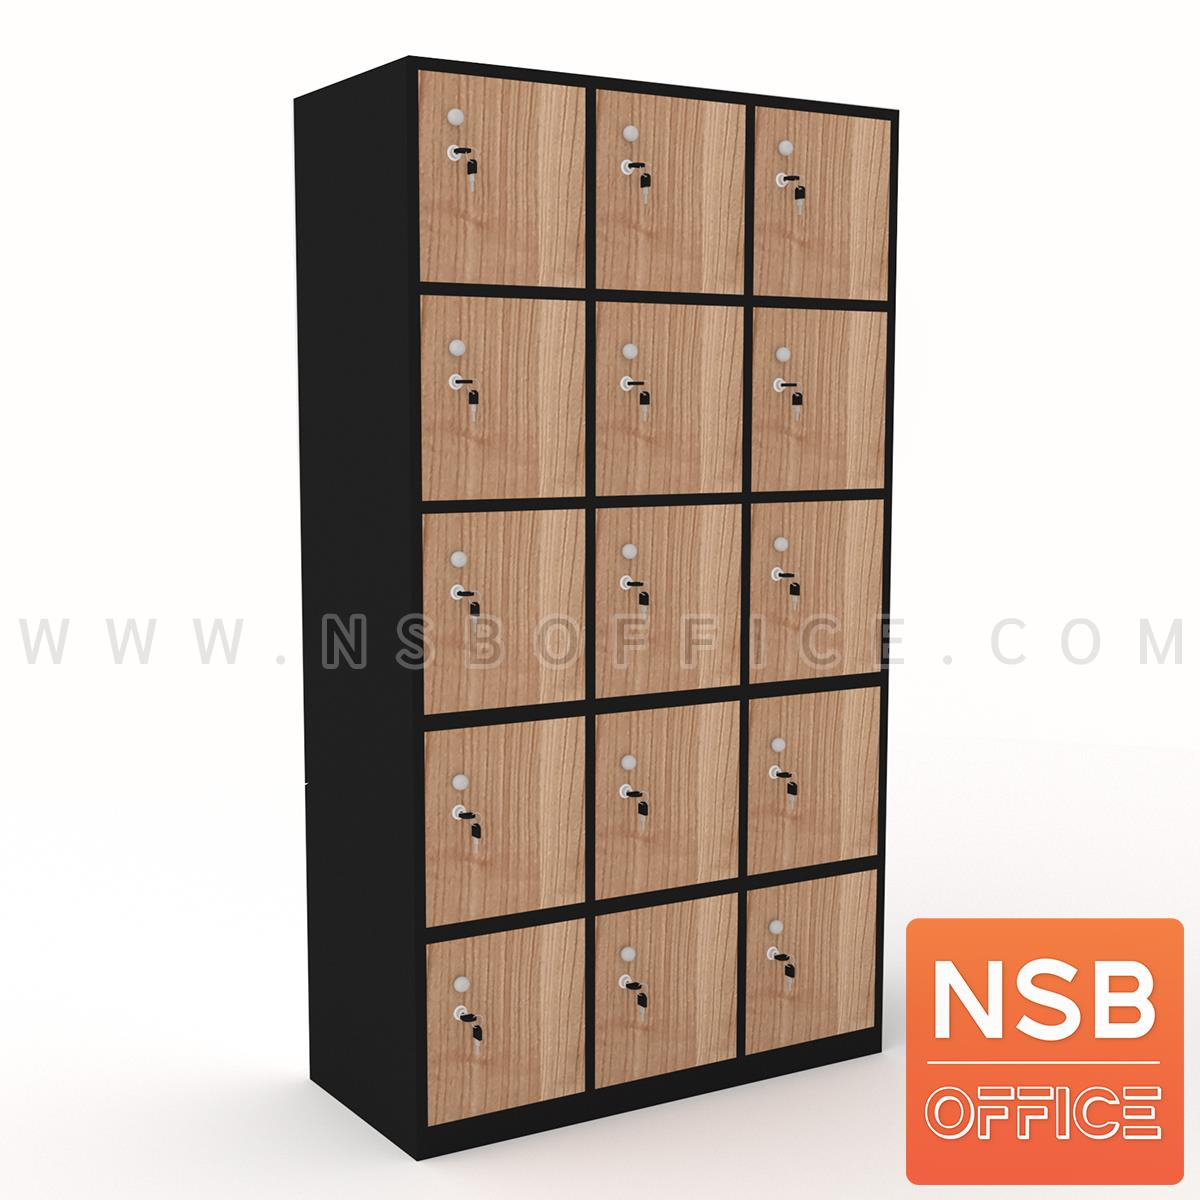 C13A013:ตู้ล็อกเกอร์ไม้ 15 ประตู รุ่นน Nivosa 5 (นิโวซ่า 5) ขนาด 90W ,120W*160H cm.  พร้อมกุญแจล็อค